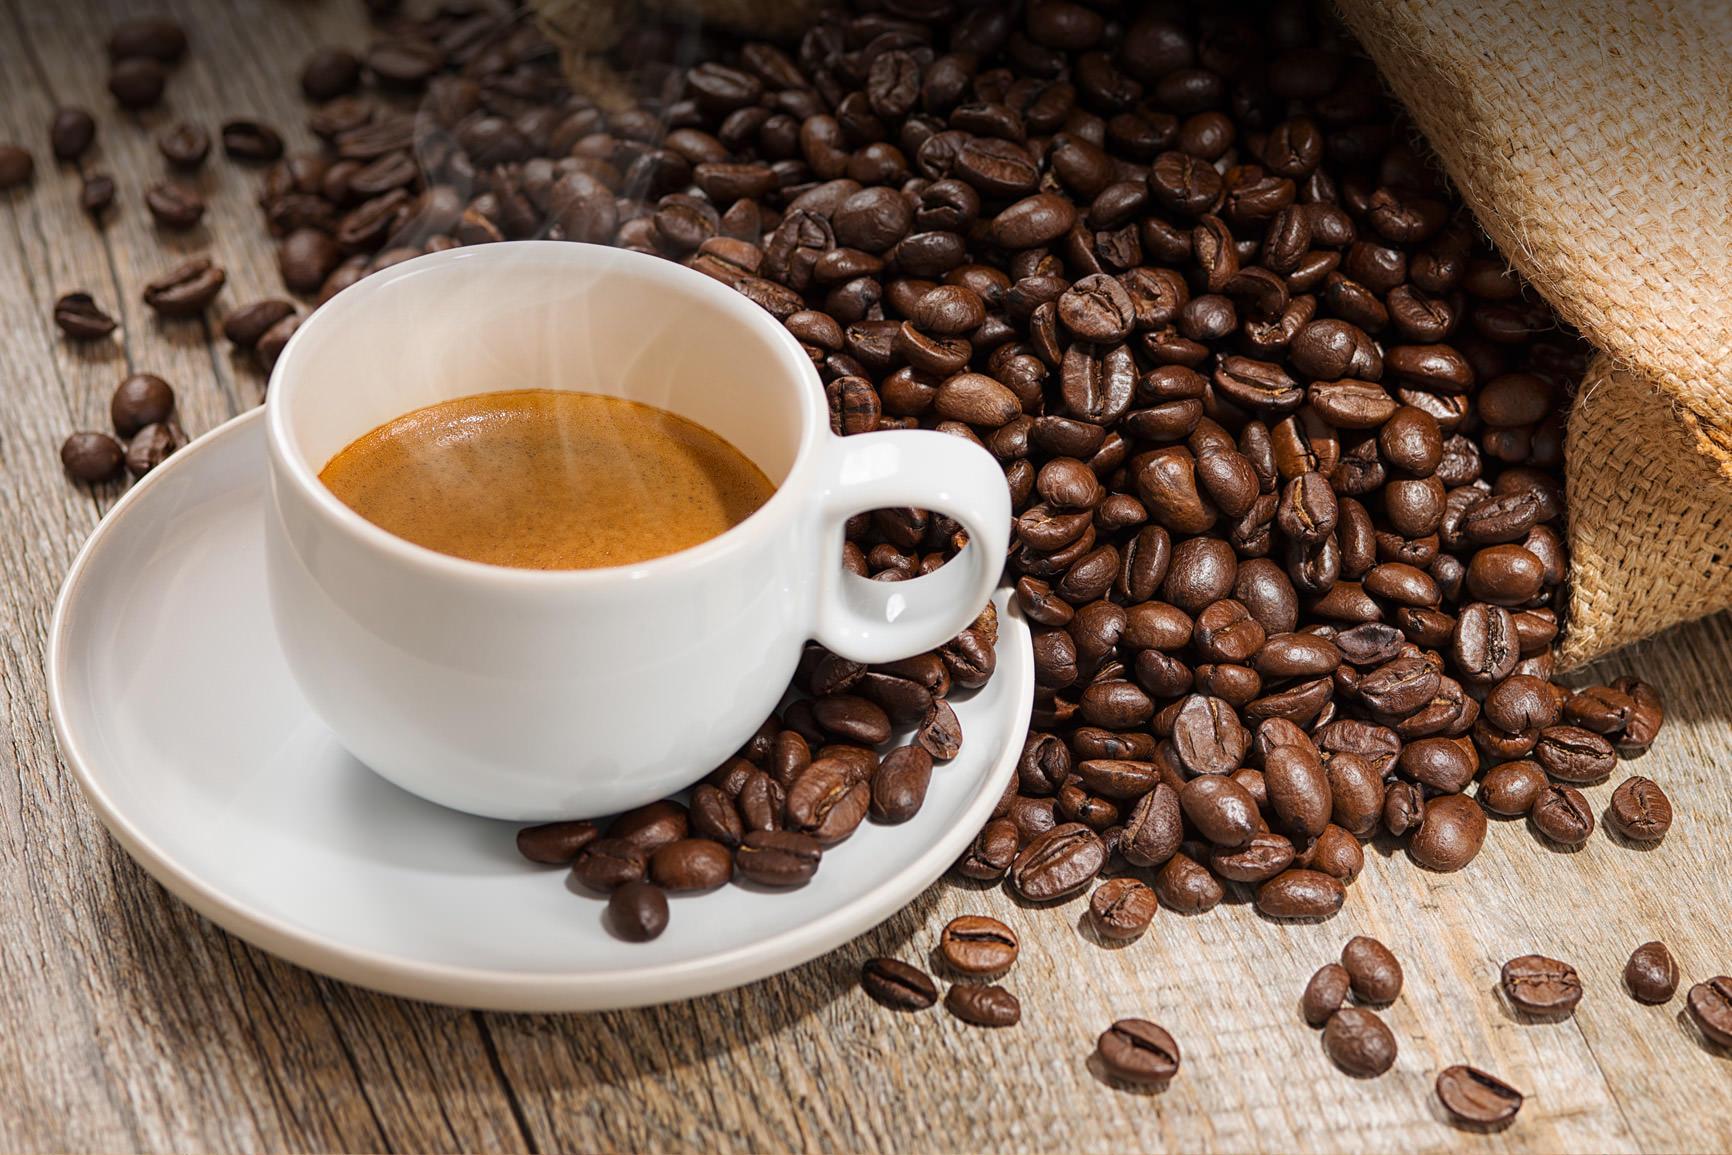 caffe_napoletano_slide1